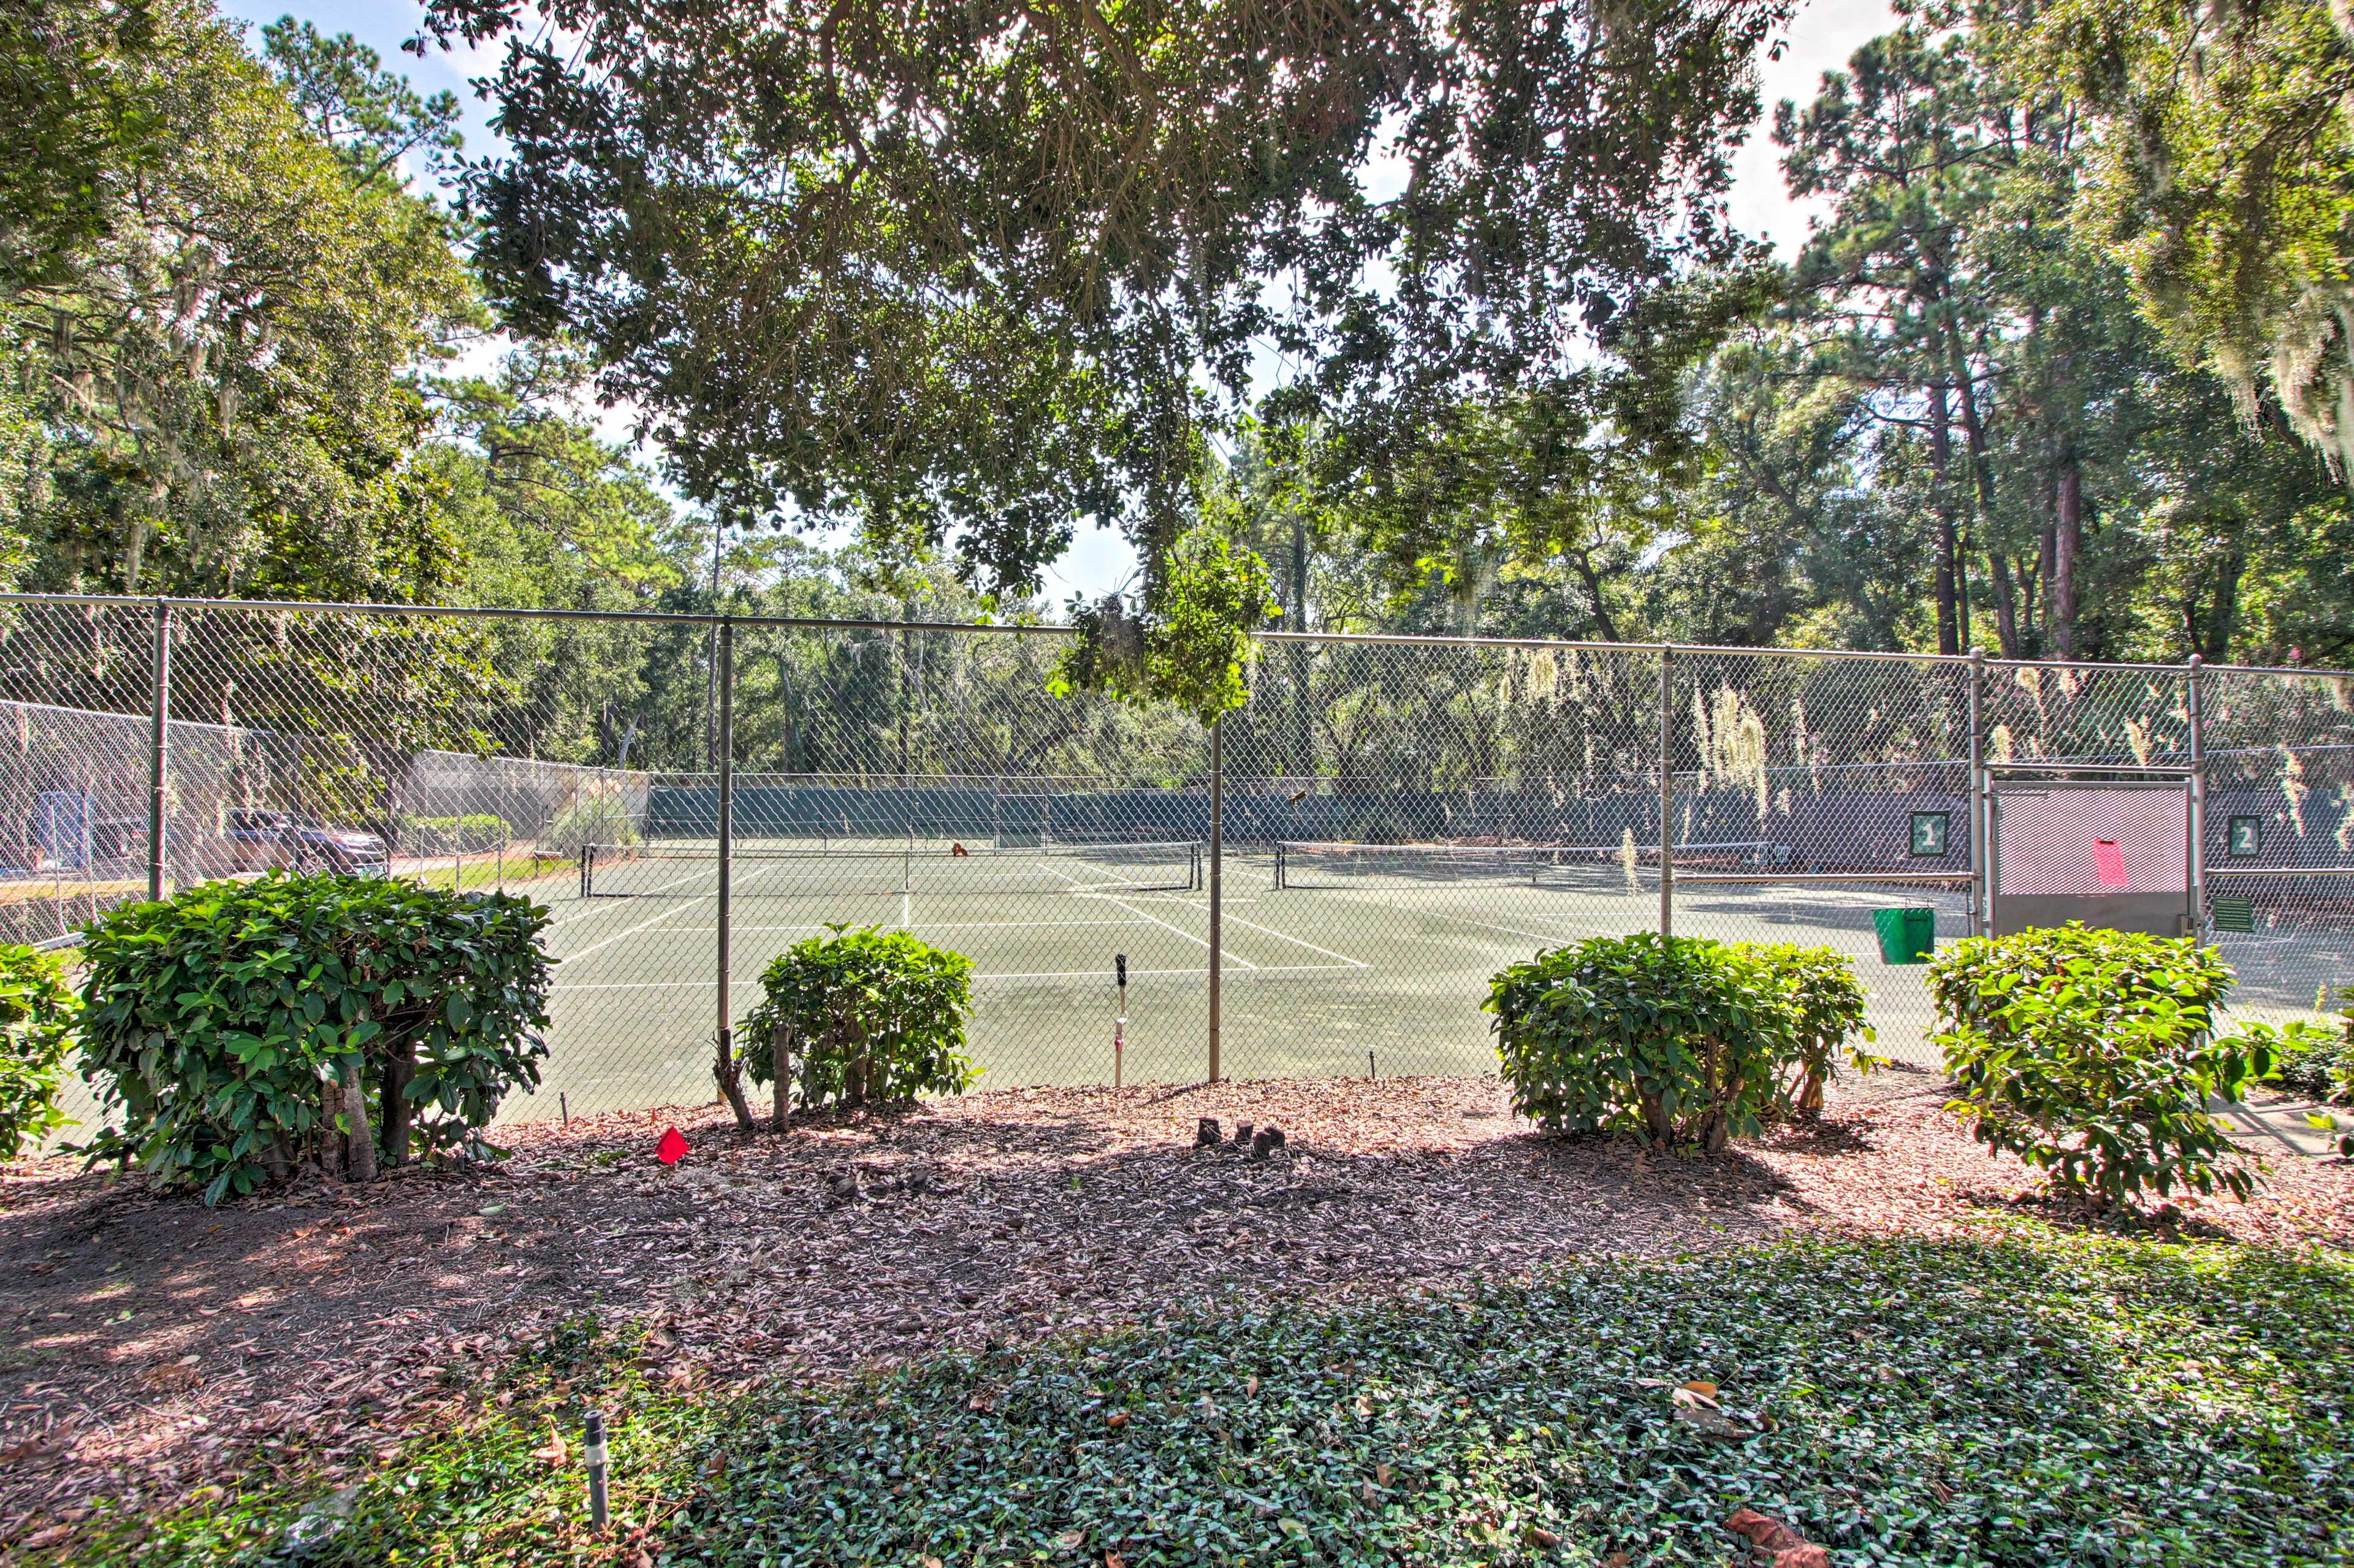 Bring along your tennis gear!